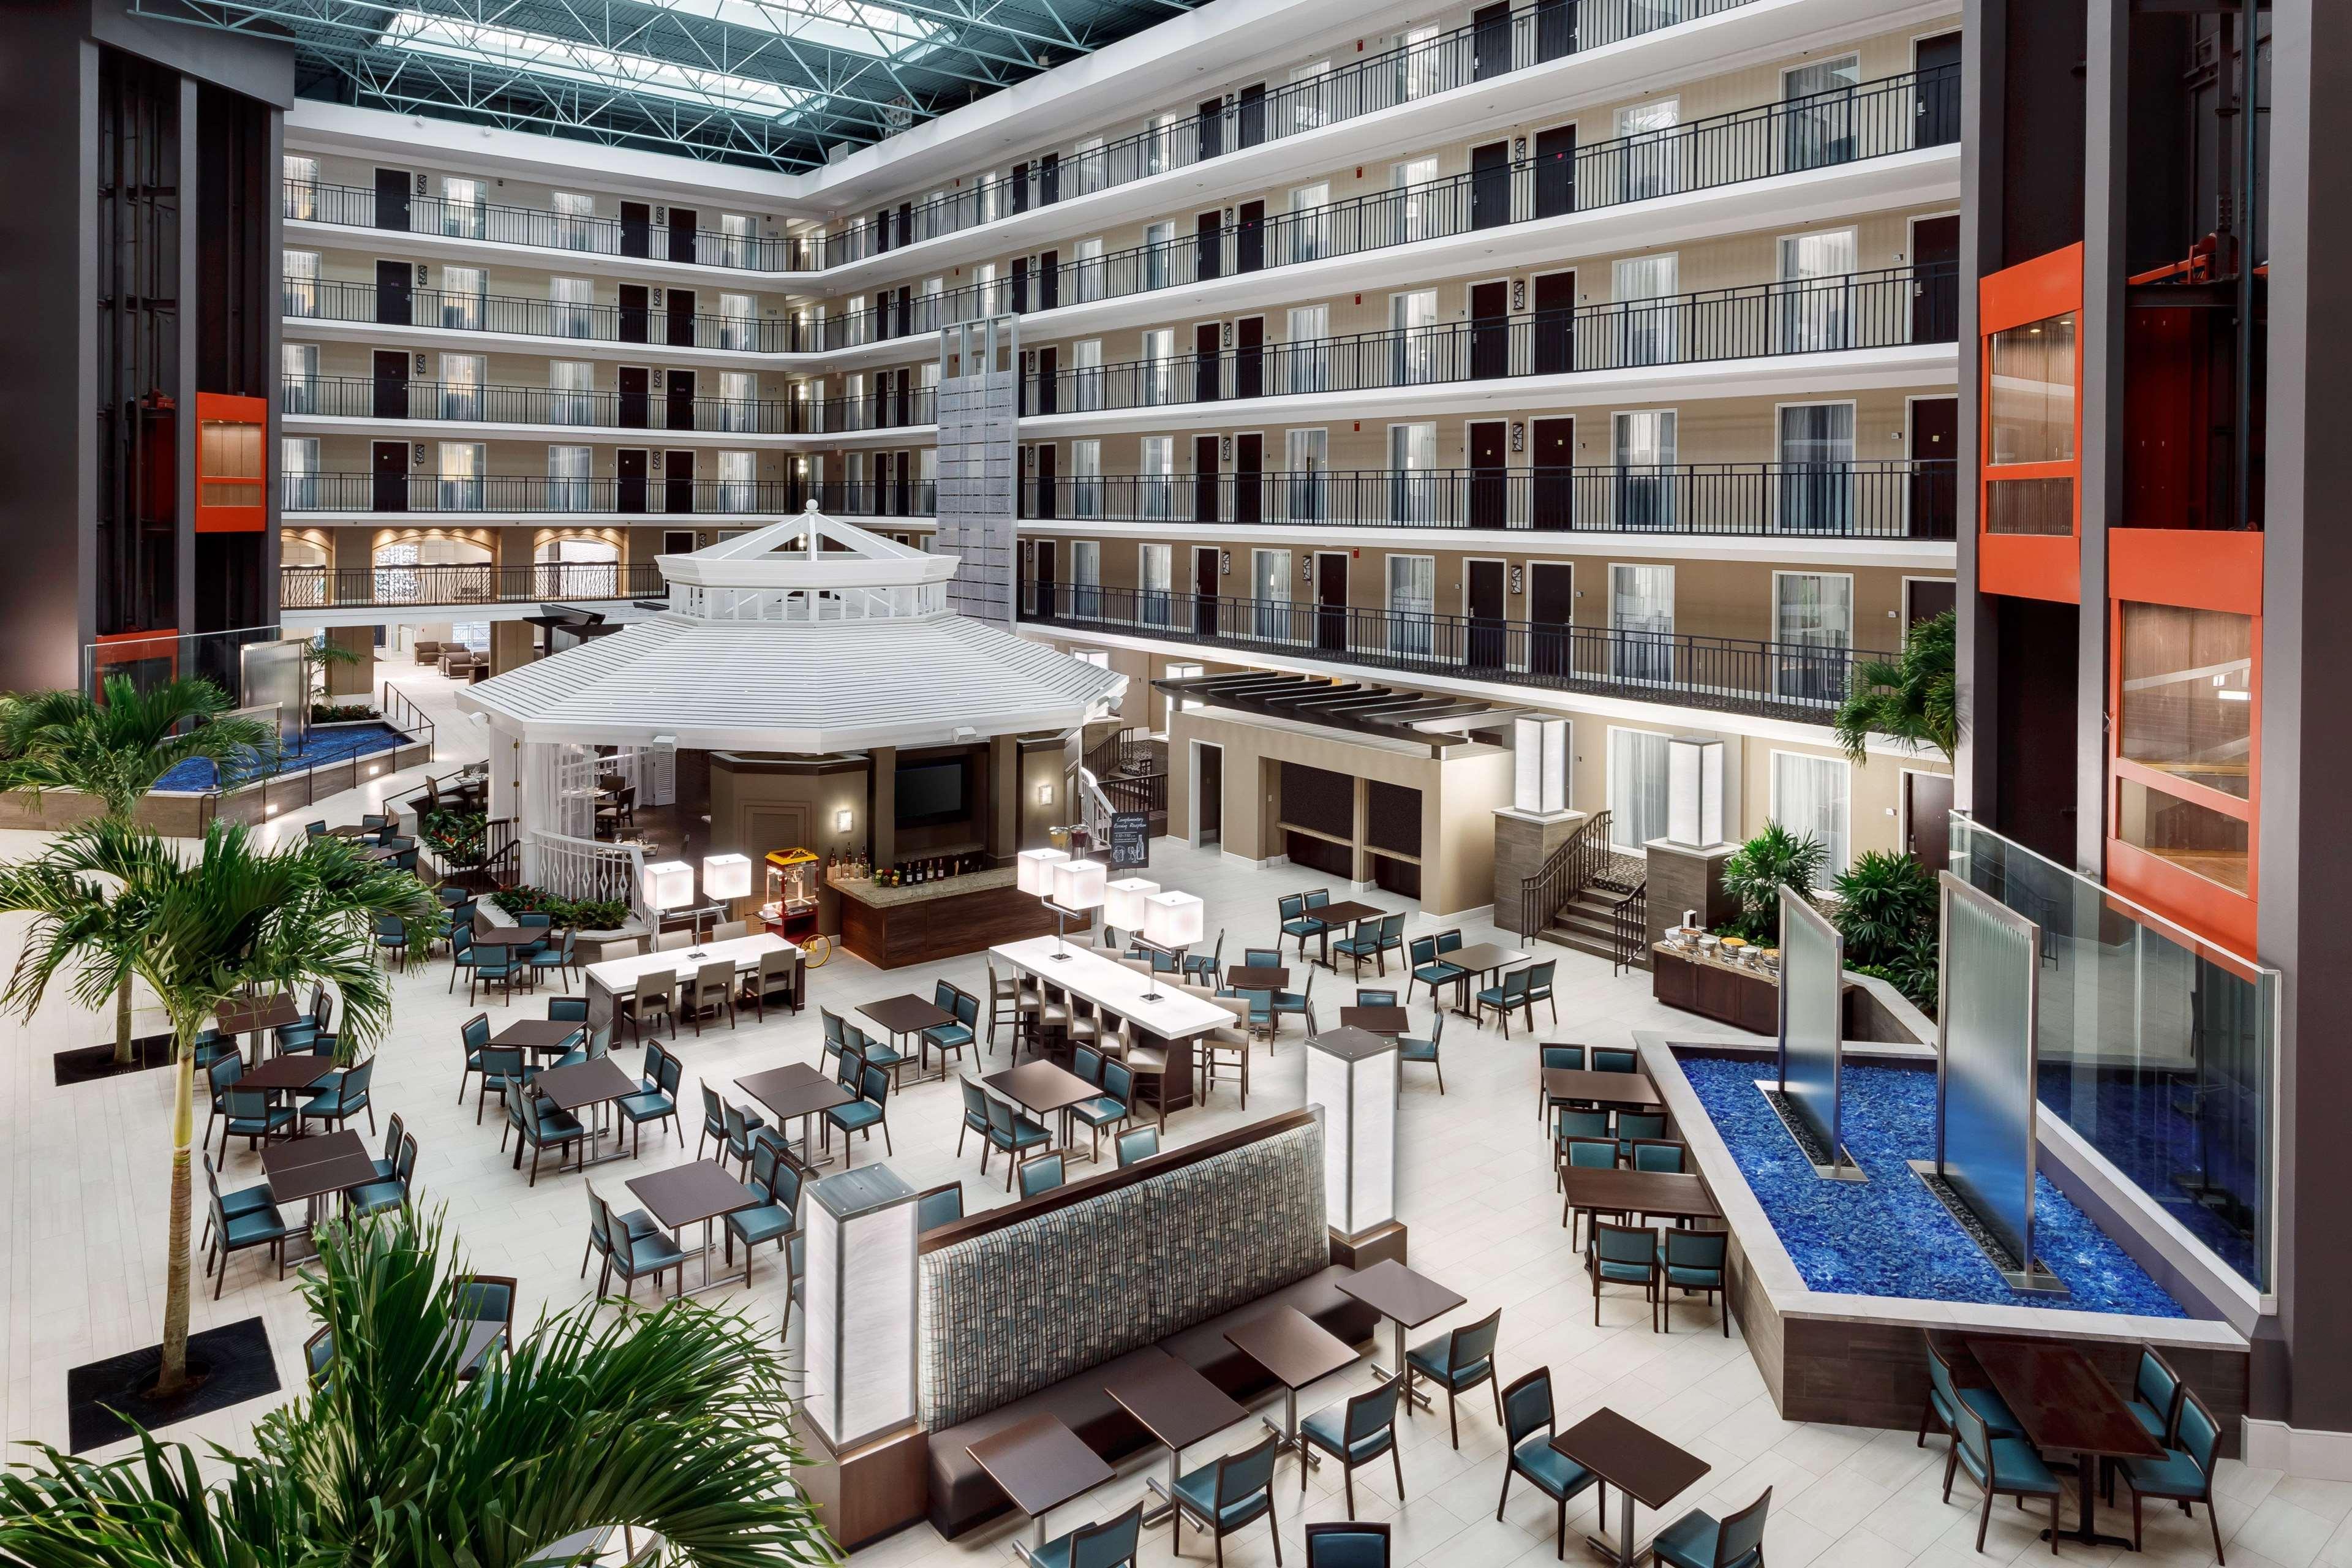 Embassy Suites by Hilton Orlando Lake Buena Vista Resort image 4